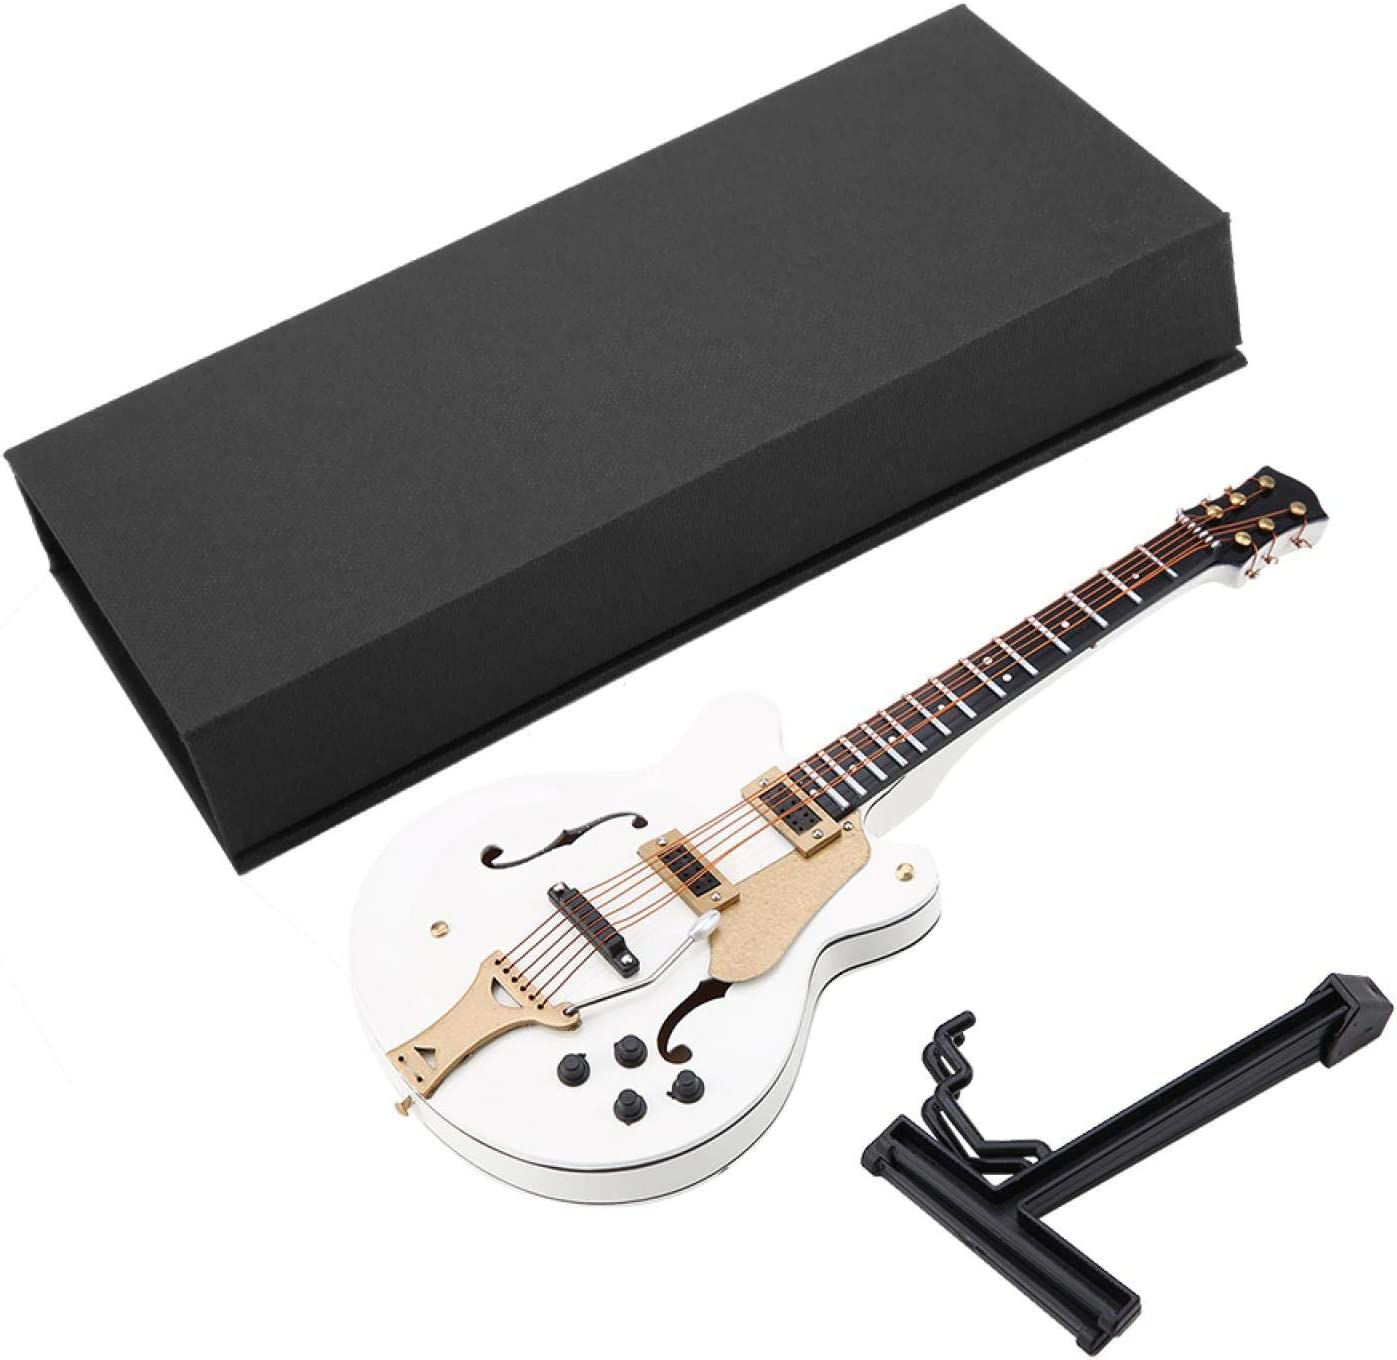 GLOGLOW Miniature 35% OFF Guitar Model Electric wi Replica lowest price White